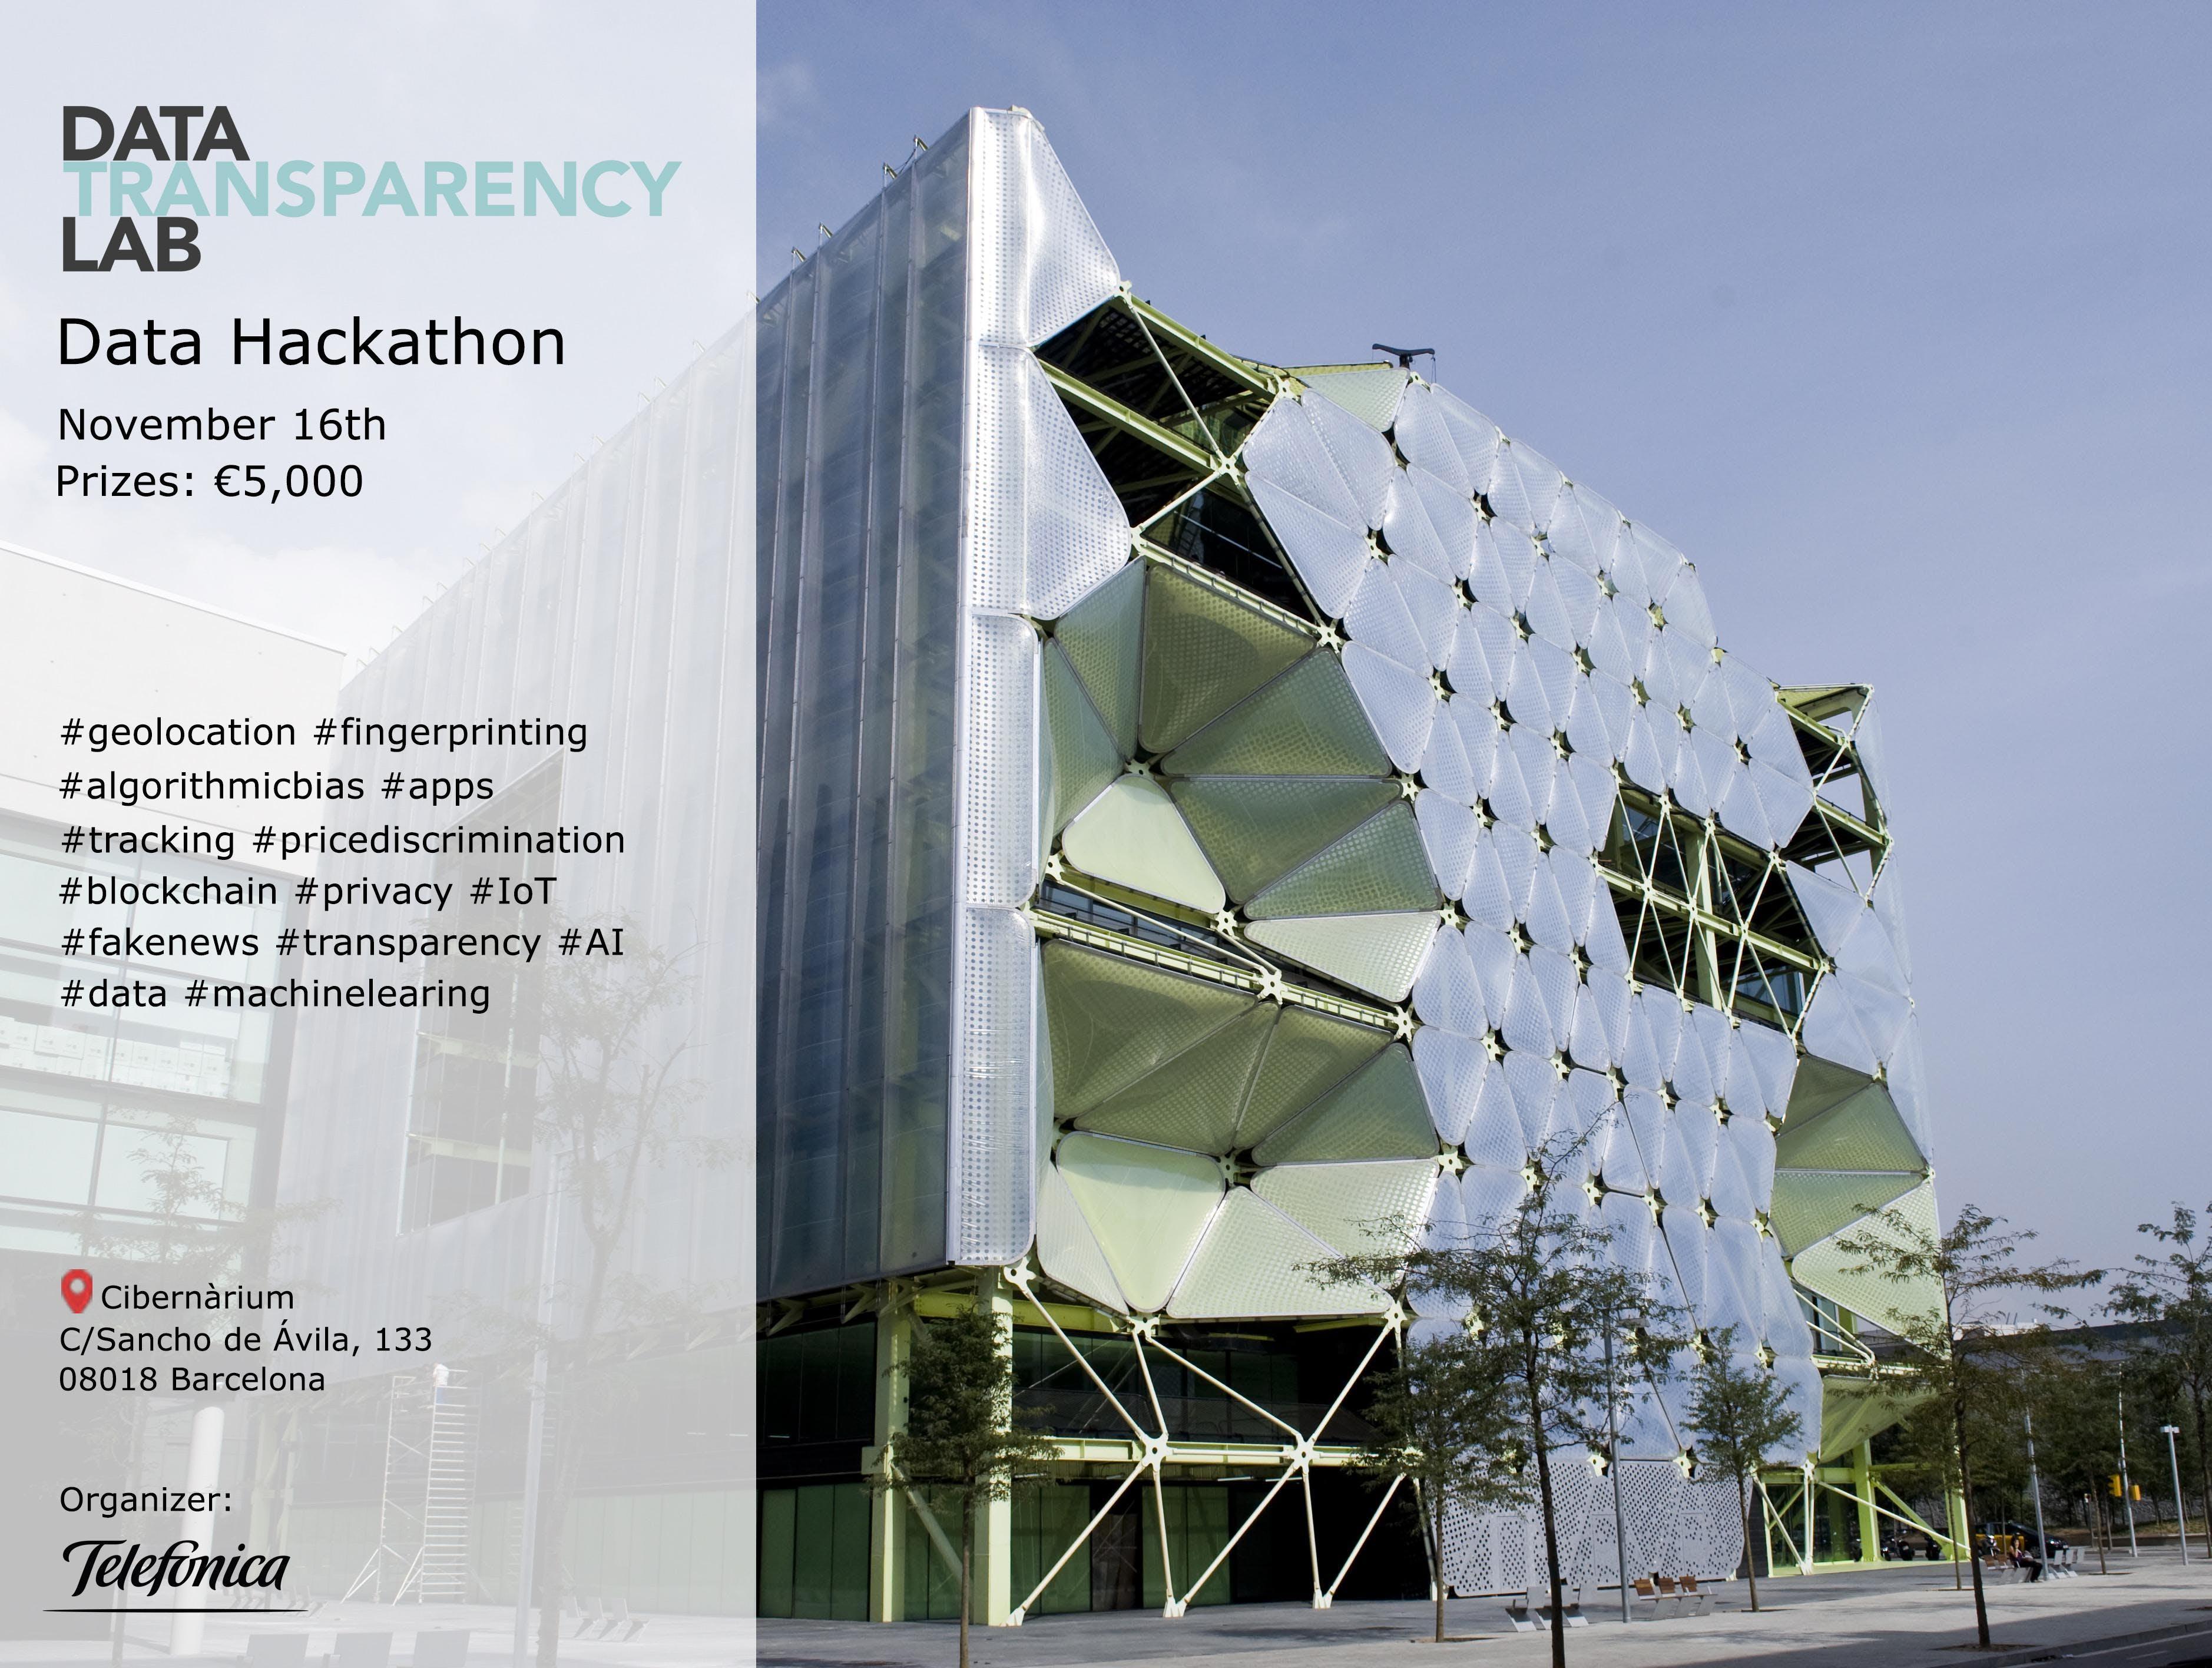 Hackathon - Data Transparency Lab 2018